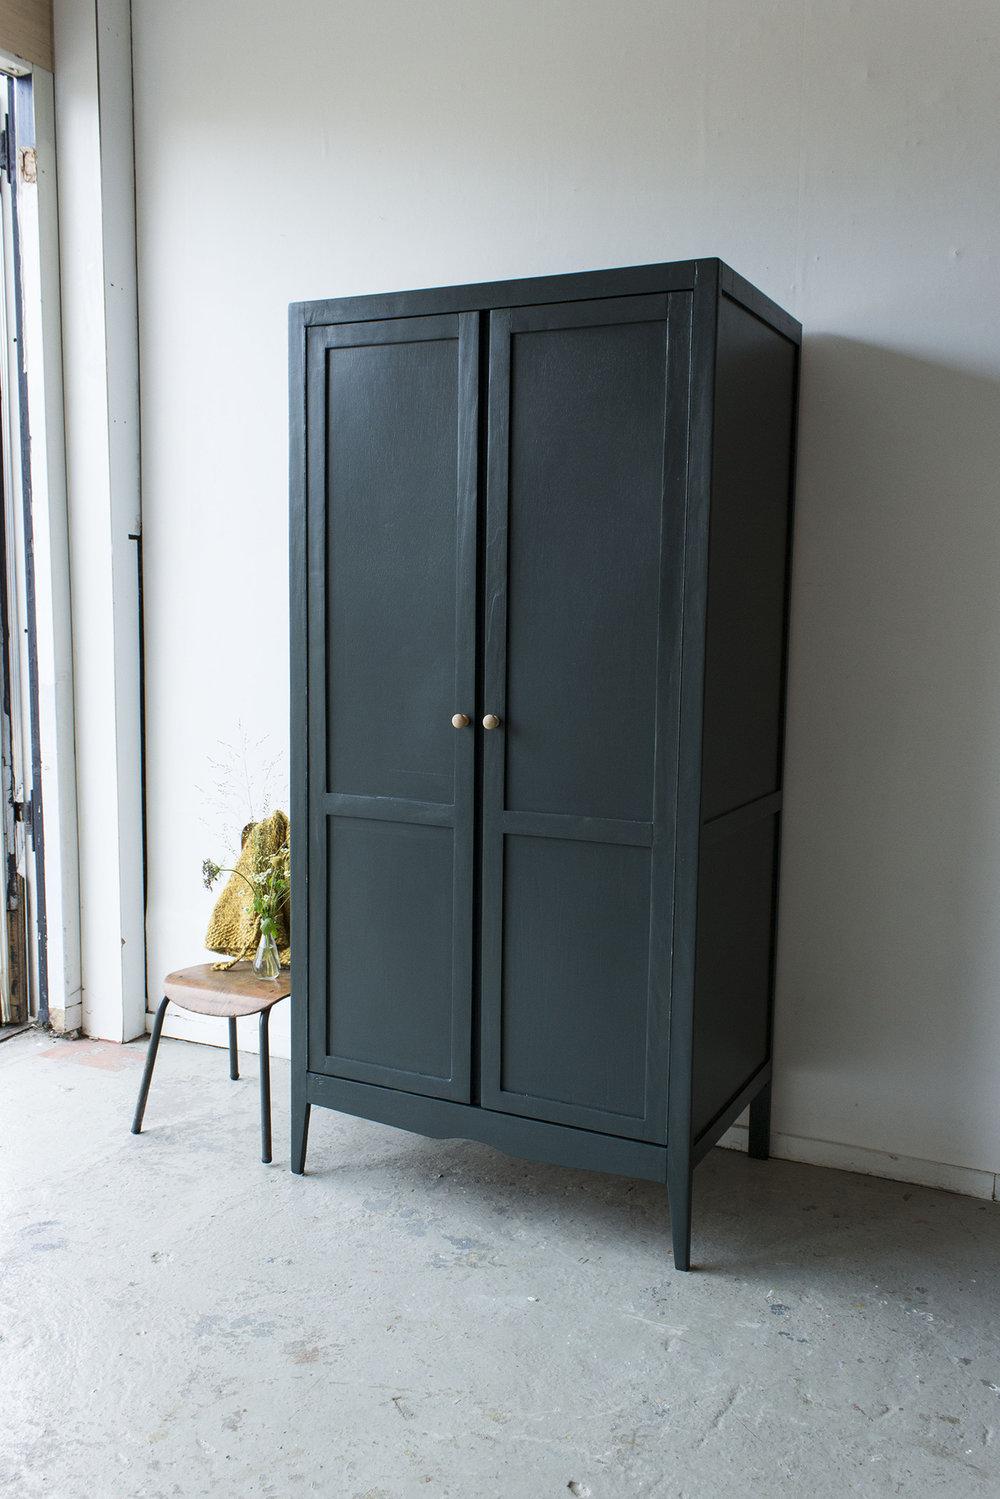 Woudgroen vintage kledingkastje -  Firma zoethout_2.jpg